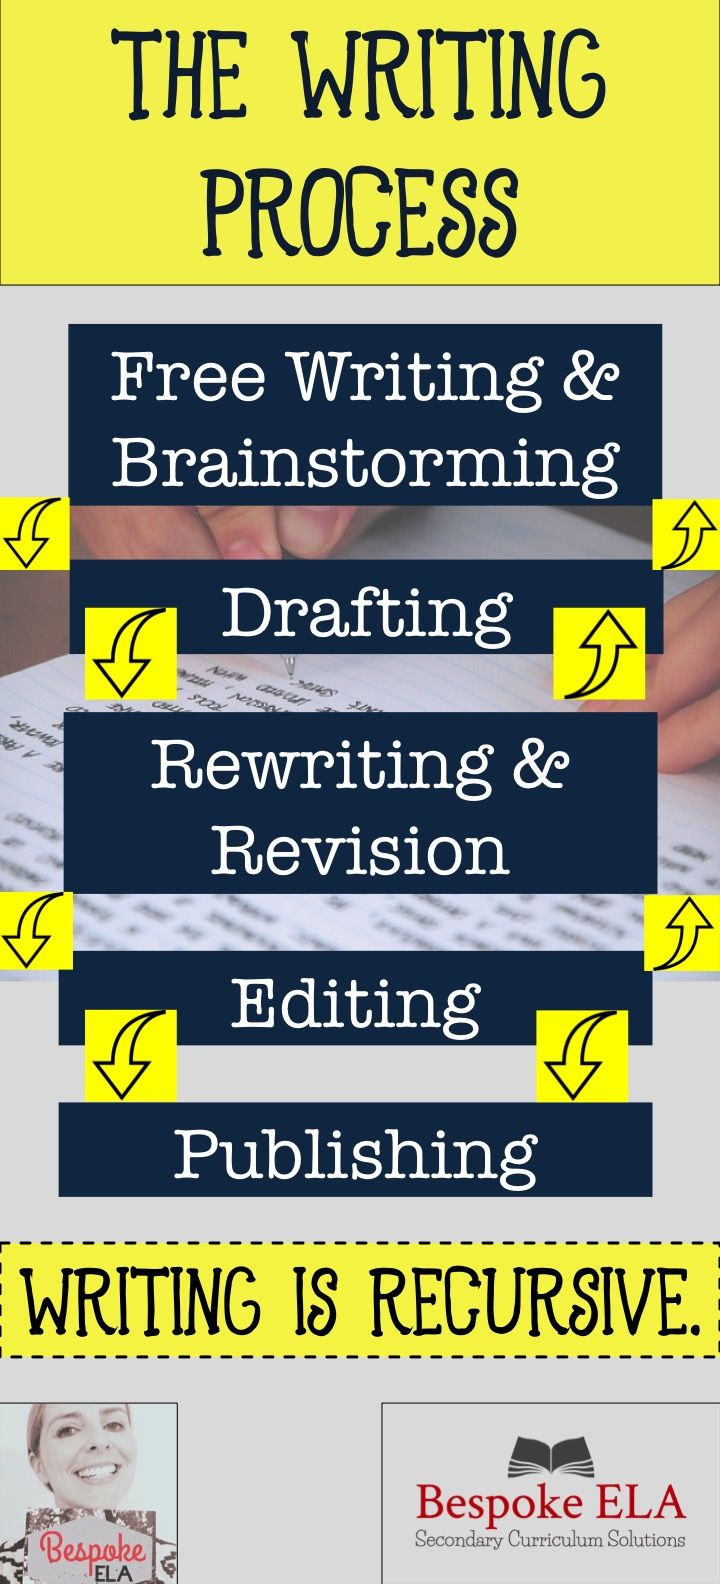 The Writing Process English Language Arts Free Writing Brainstorming Drafting Rewriting Revision Editing Publishing Bespoke ELA